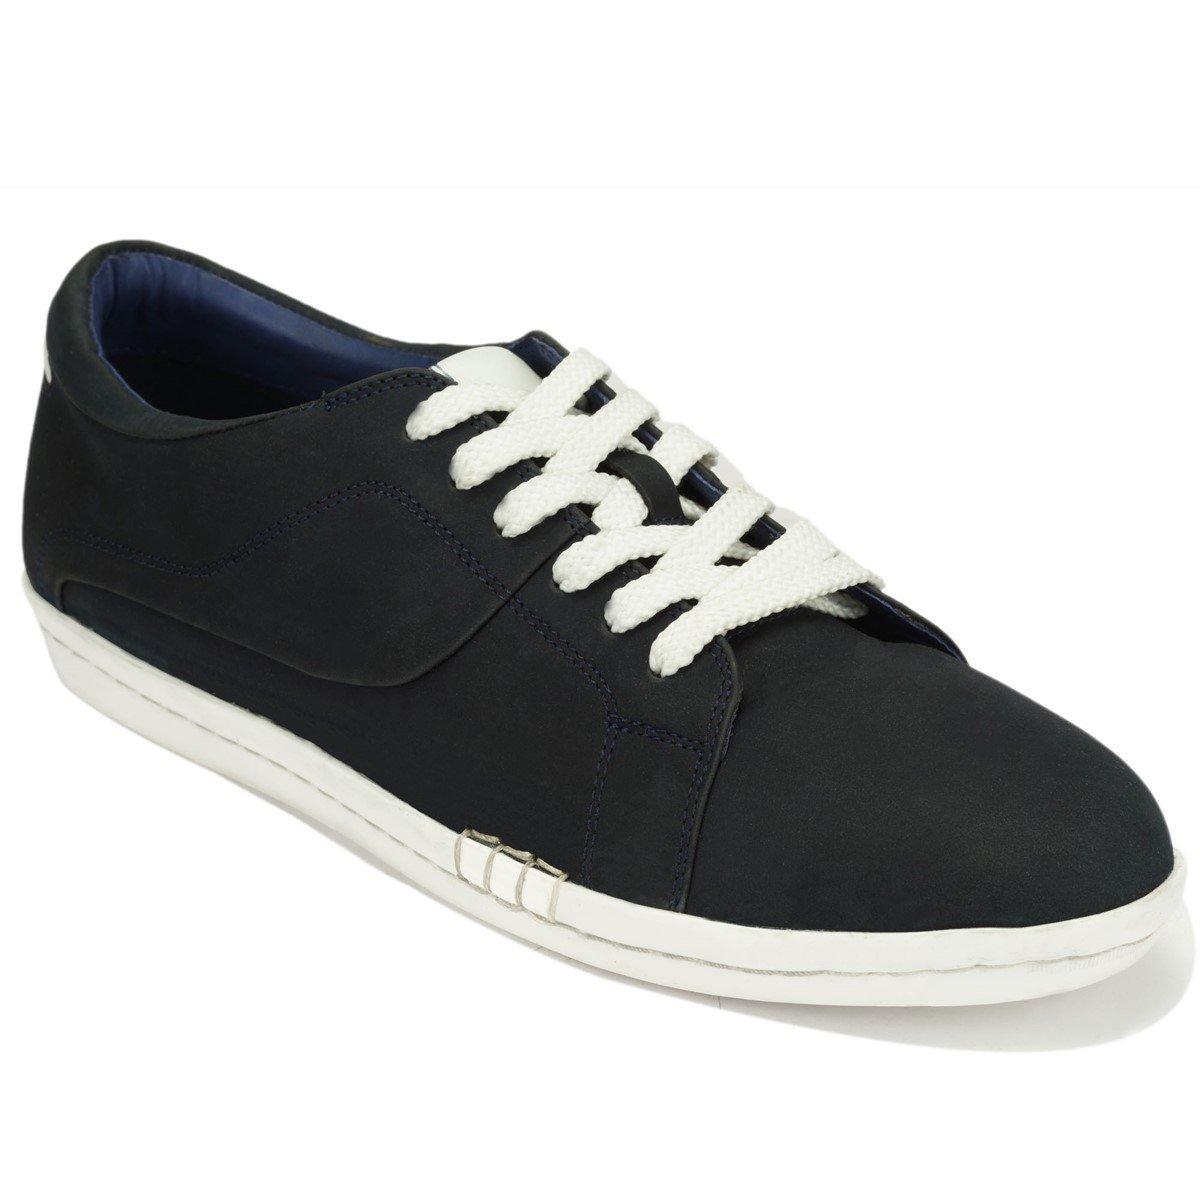 Scottwilliams Amati Premium - Zapatillas de Deporte de Cuero para Hombre P41|Azul Marino